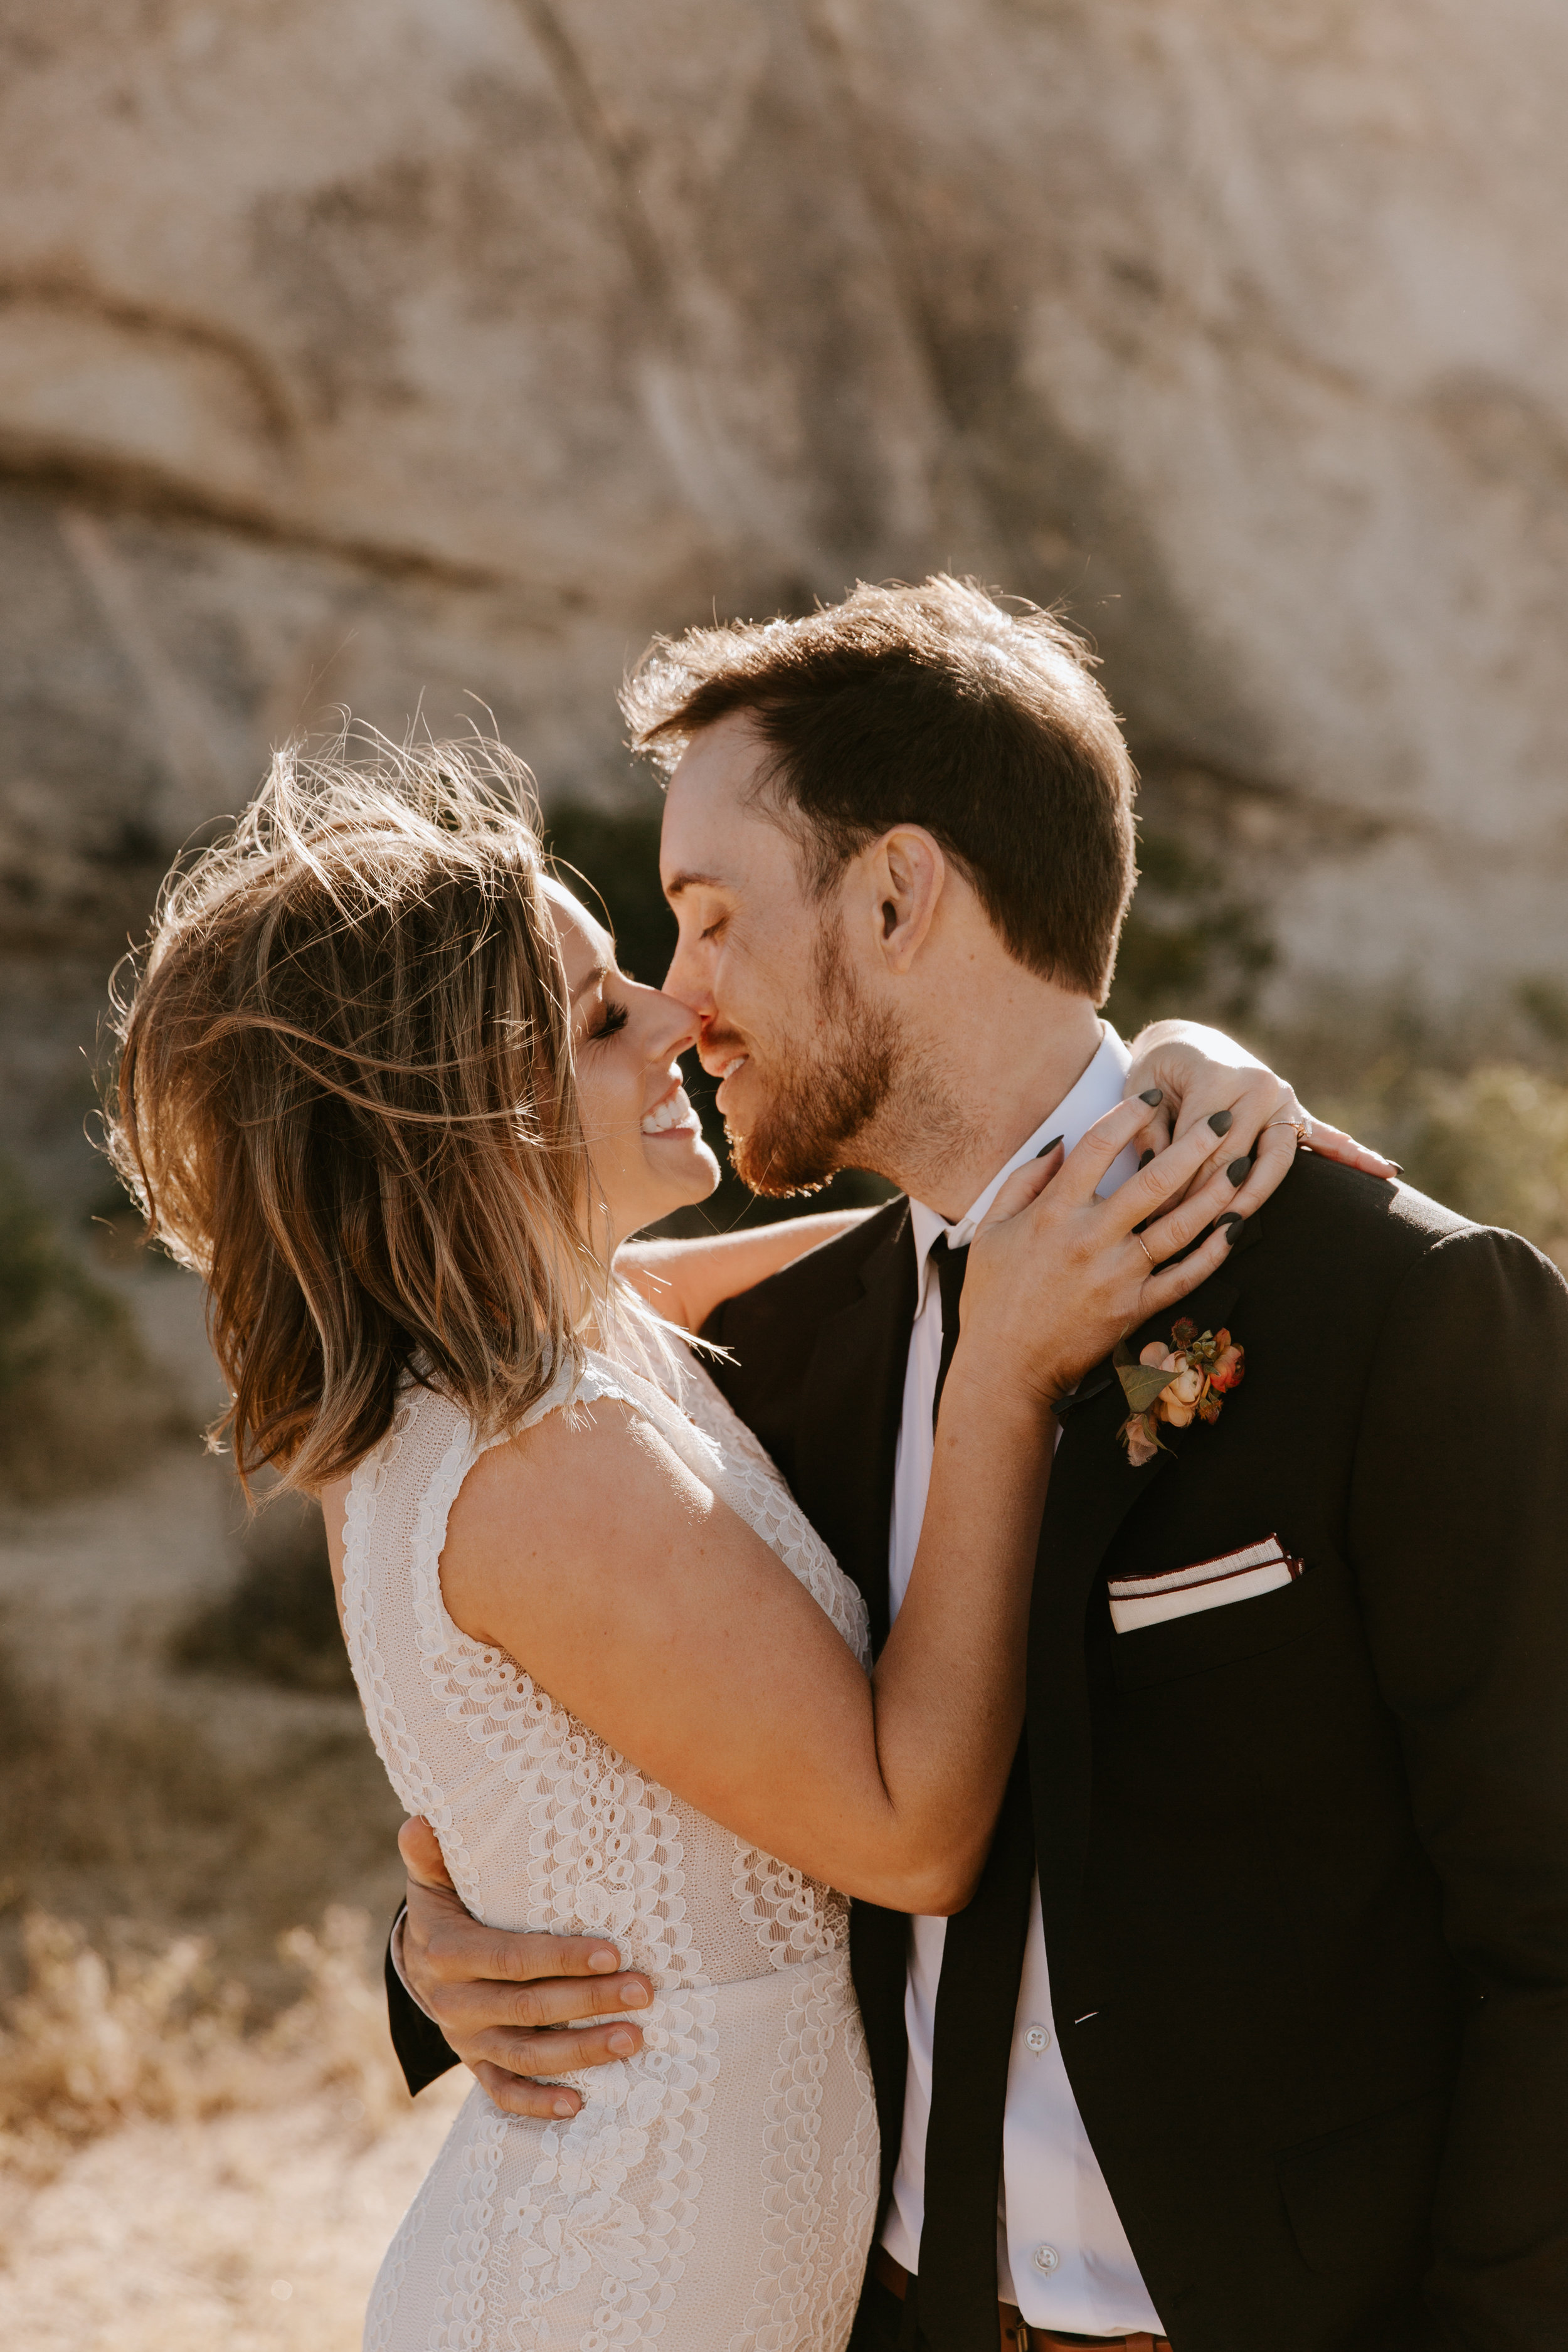 2019-05-26_Callie-Evan_Wedding_Joshua Tree_Paige Nelson_PREVIEWS HR-43.jpg